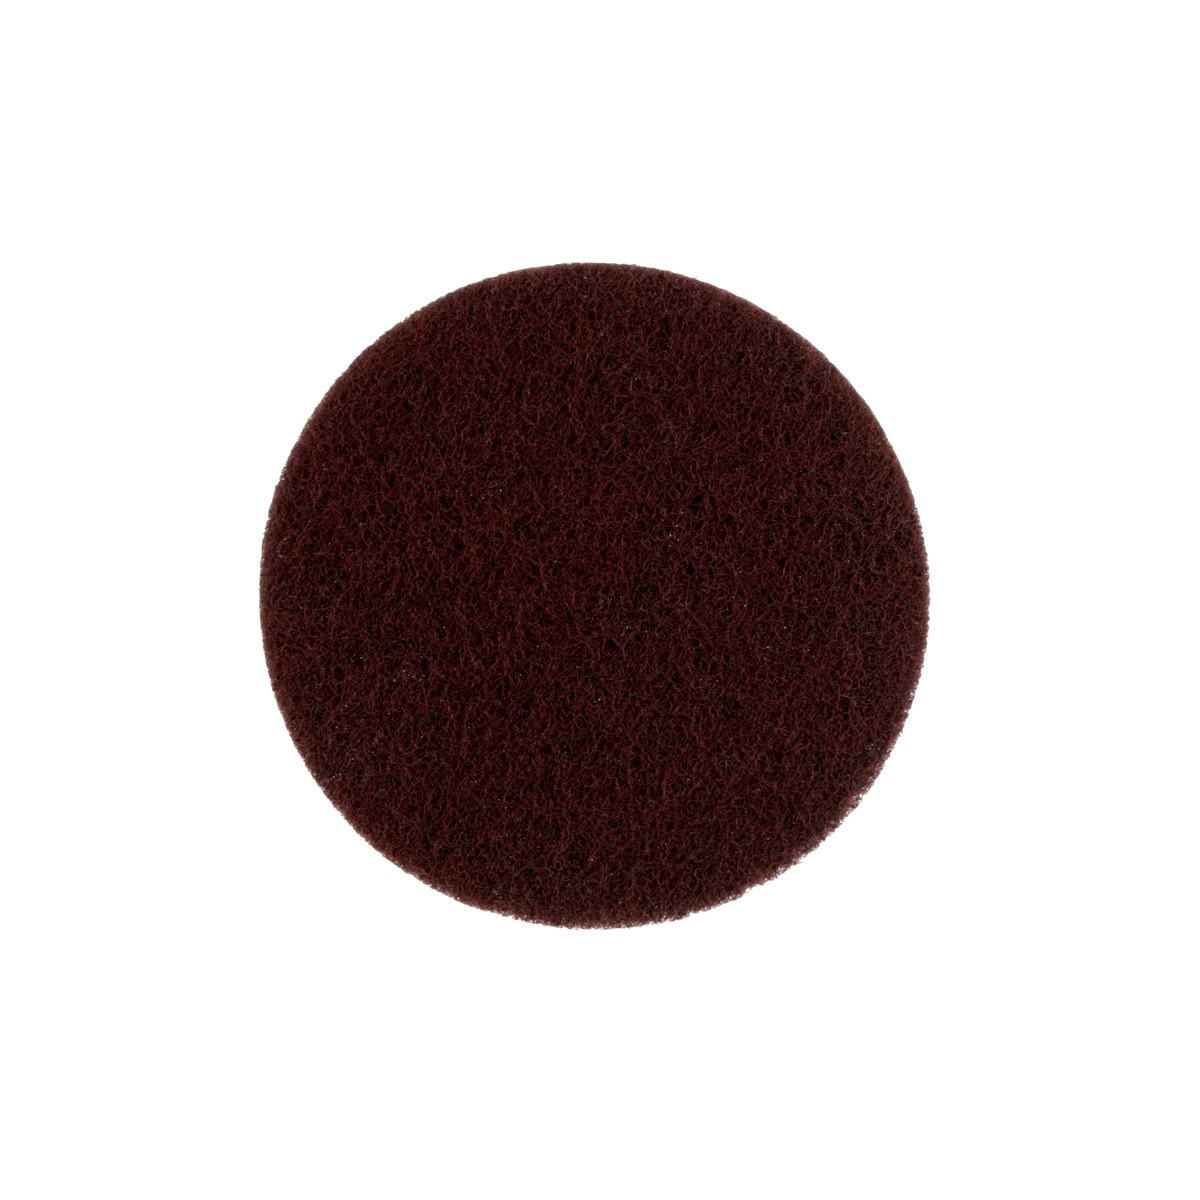 Non-Woven Finishing Disc 2 in Disc Dia Aluminum Oxide 150 Units 12000 RPM